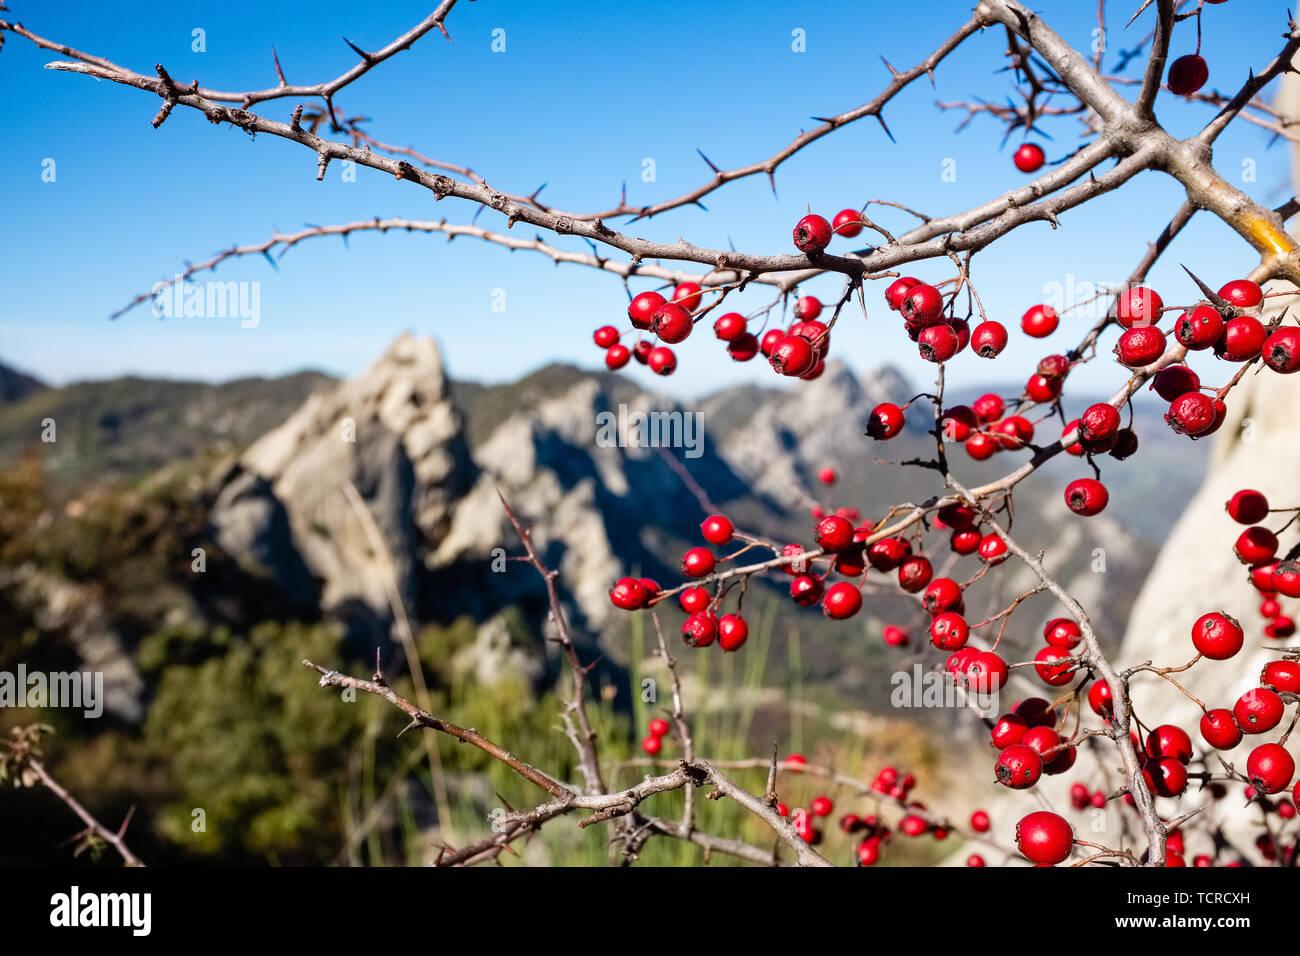 Red wild berries. Dolomites of Basilicata mountains called Dolomiti Lucane. Basilicata region, Italy - Stock Image